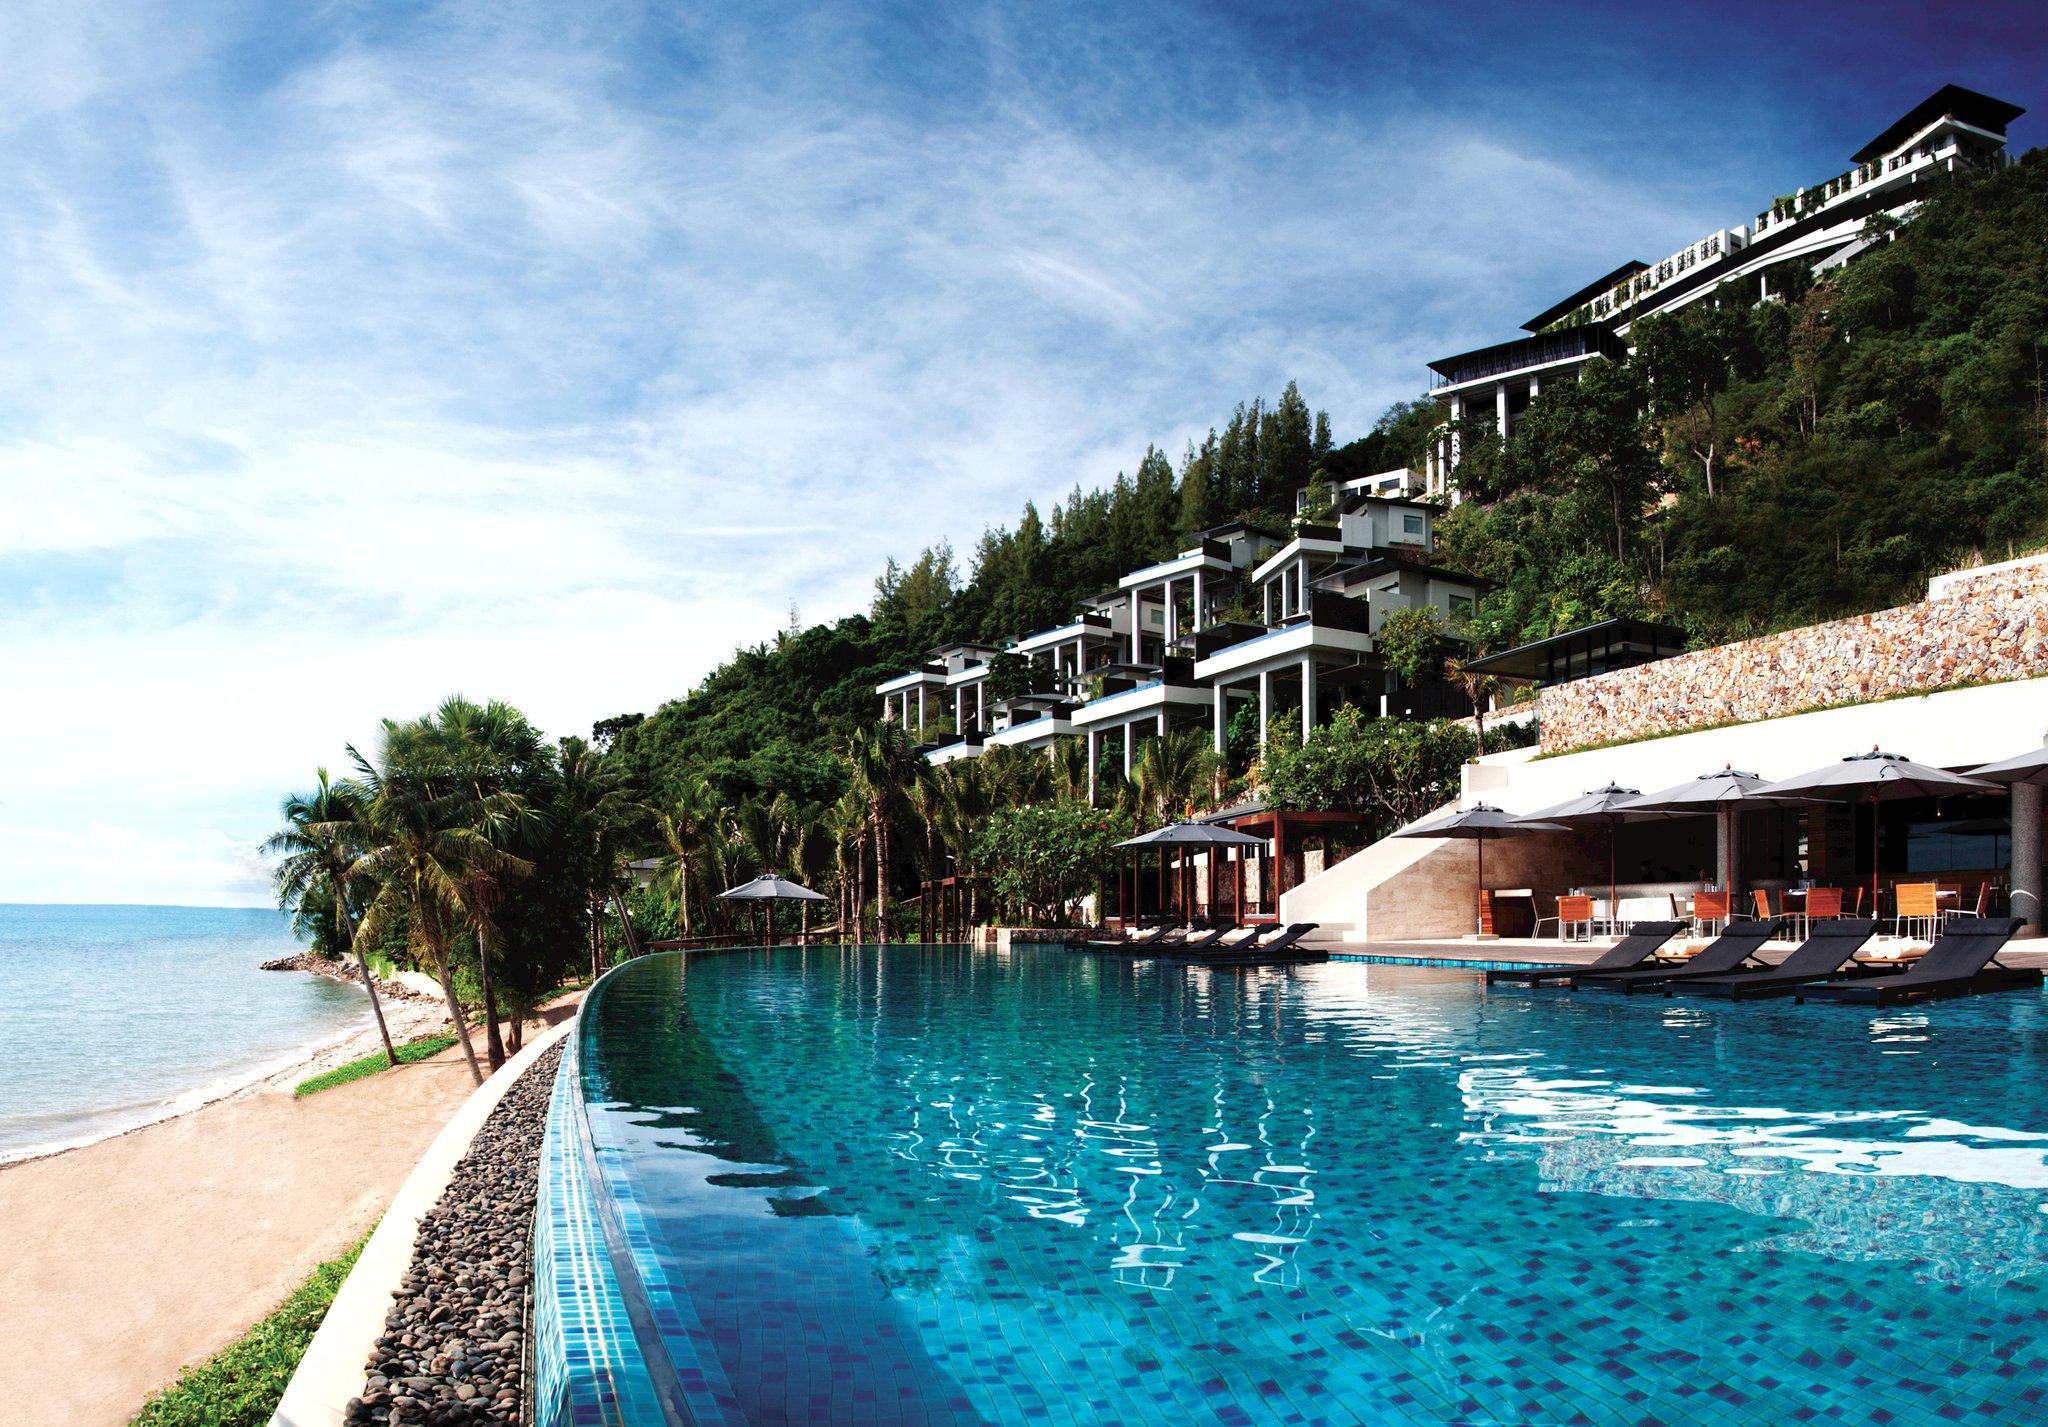 Dream wedding destination Koh Samui, Thailand